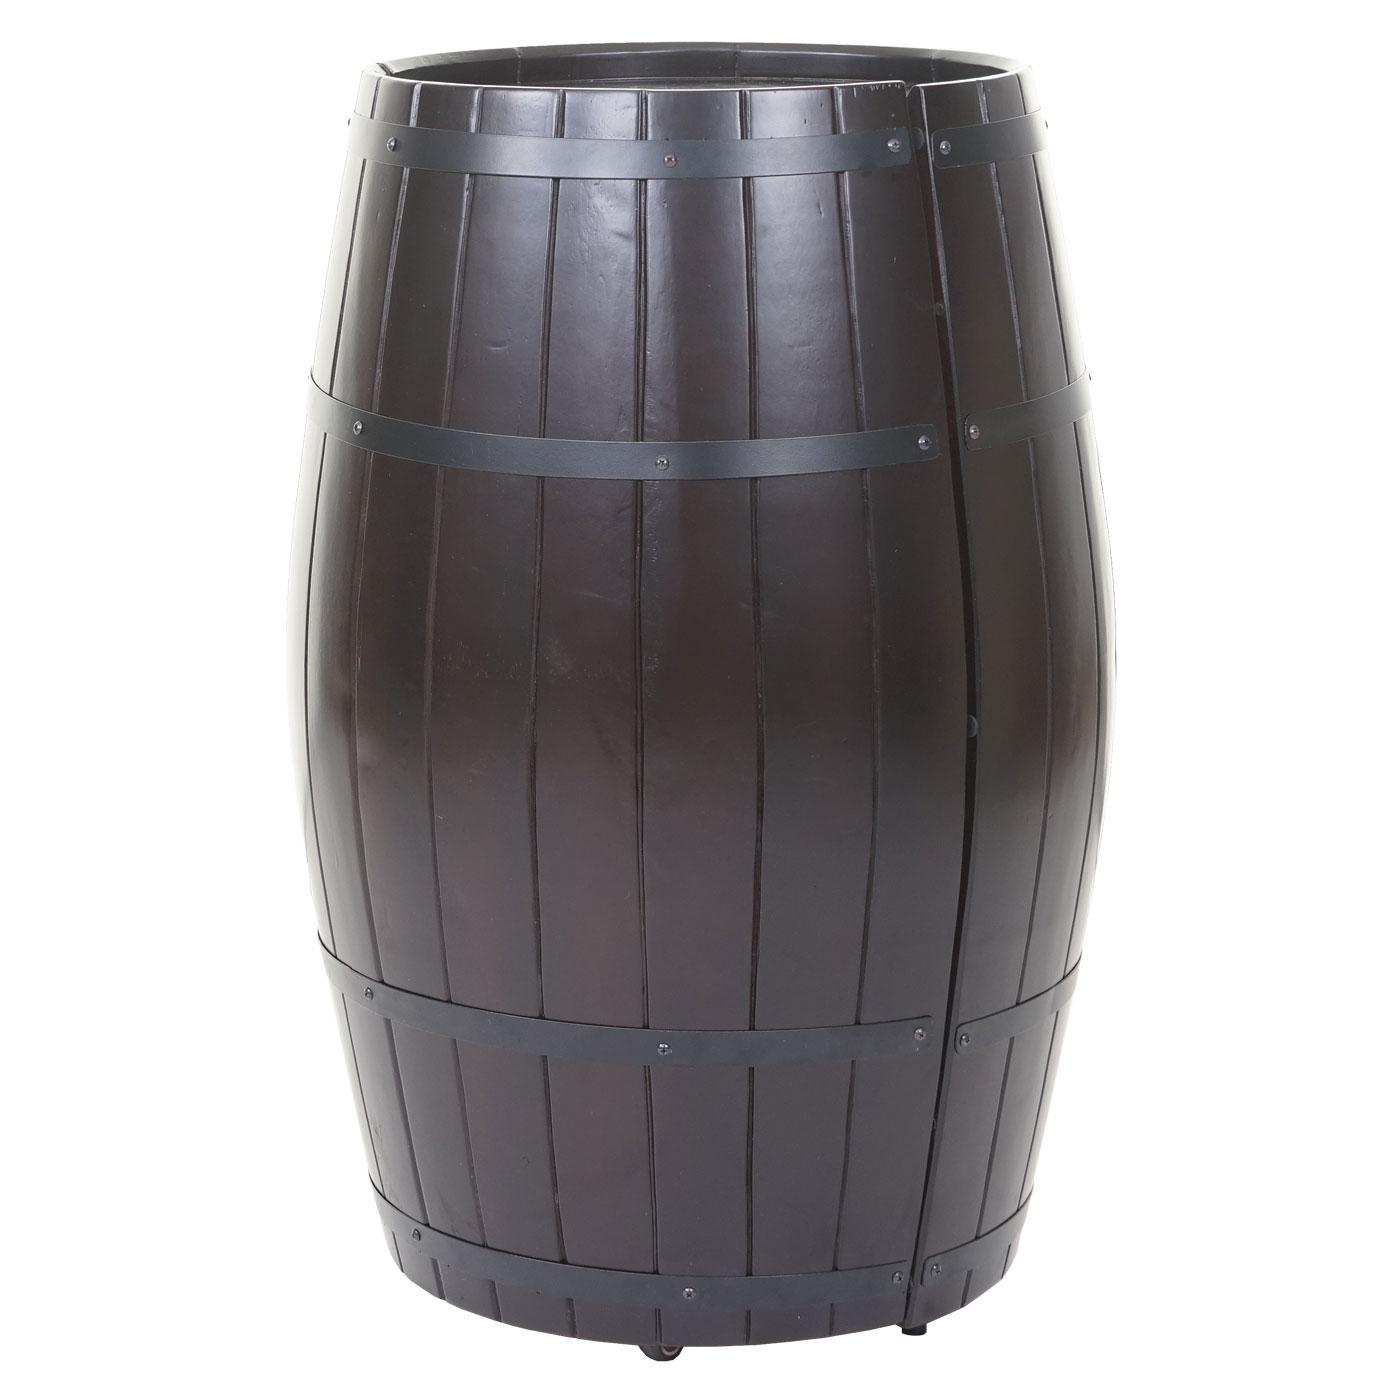 weinregal flaschenregal fass holzregal 85x52x52cm 23 flaschen. Black Bedroom Furniture Sets. Home Design Ideas